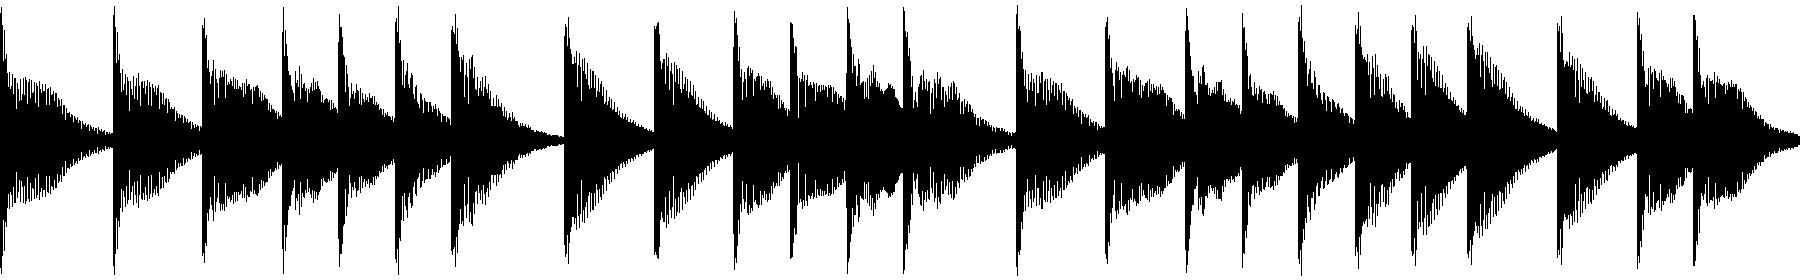 vedh melodyloop 053 fm 124bpm